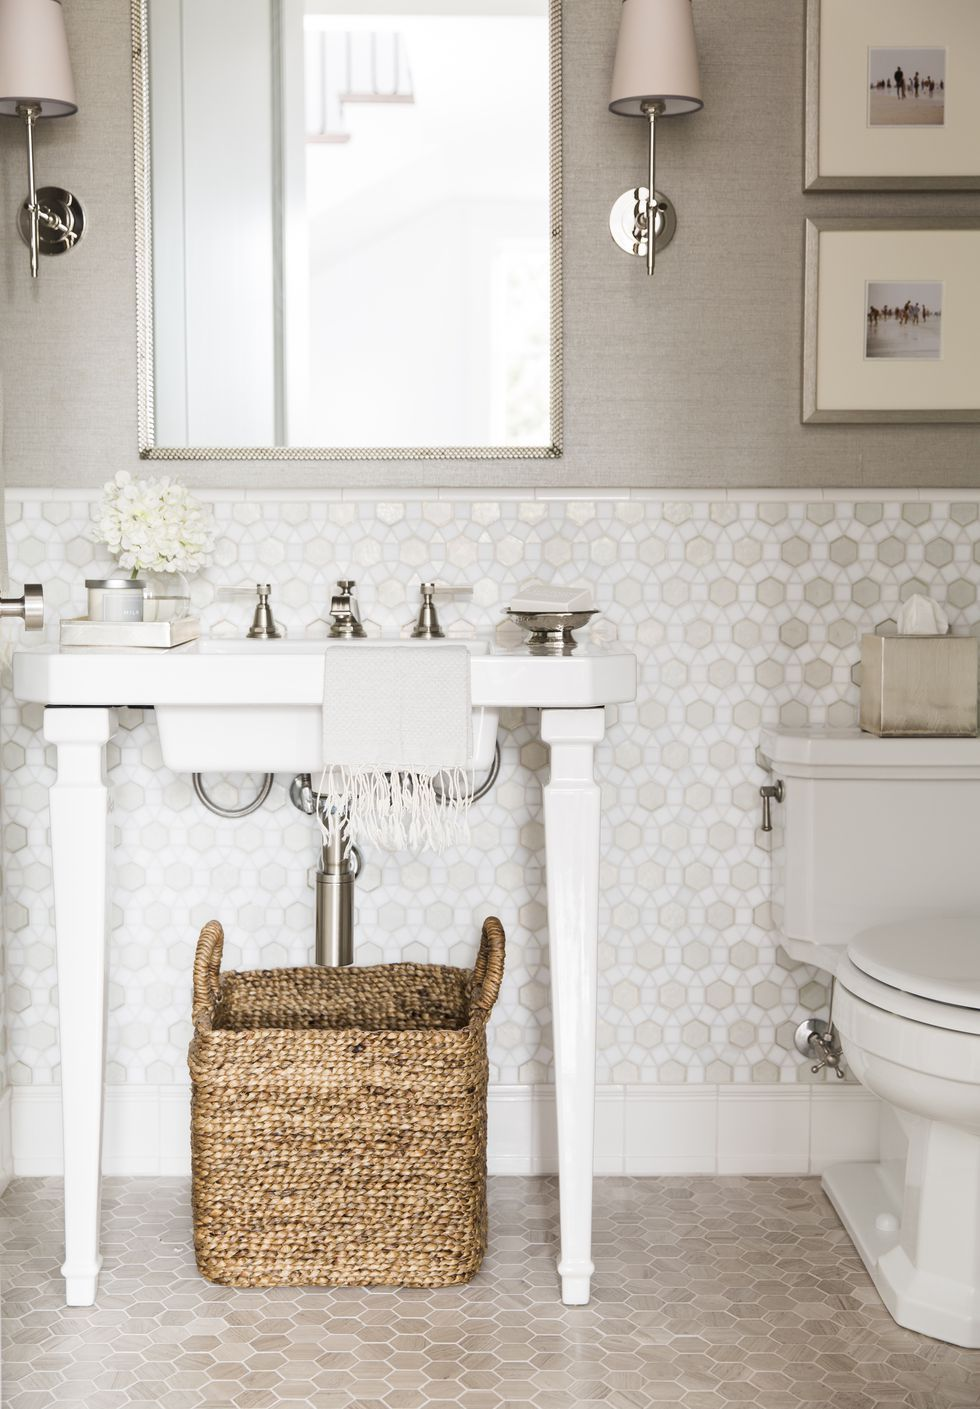 small bathroom ideas & 55 Small Bathroom Ideas - Best Designs \u0026 Decor for Small Bathrooms